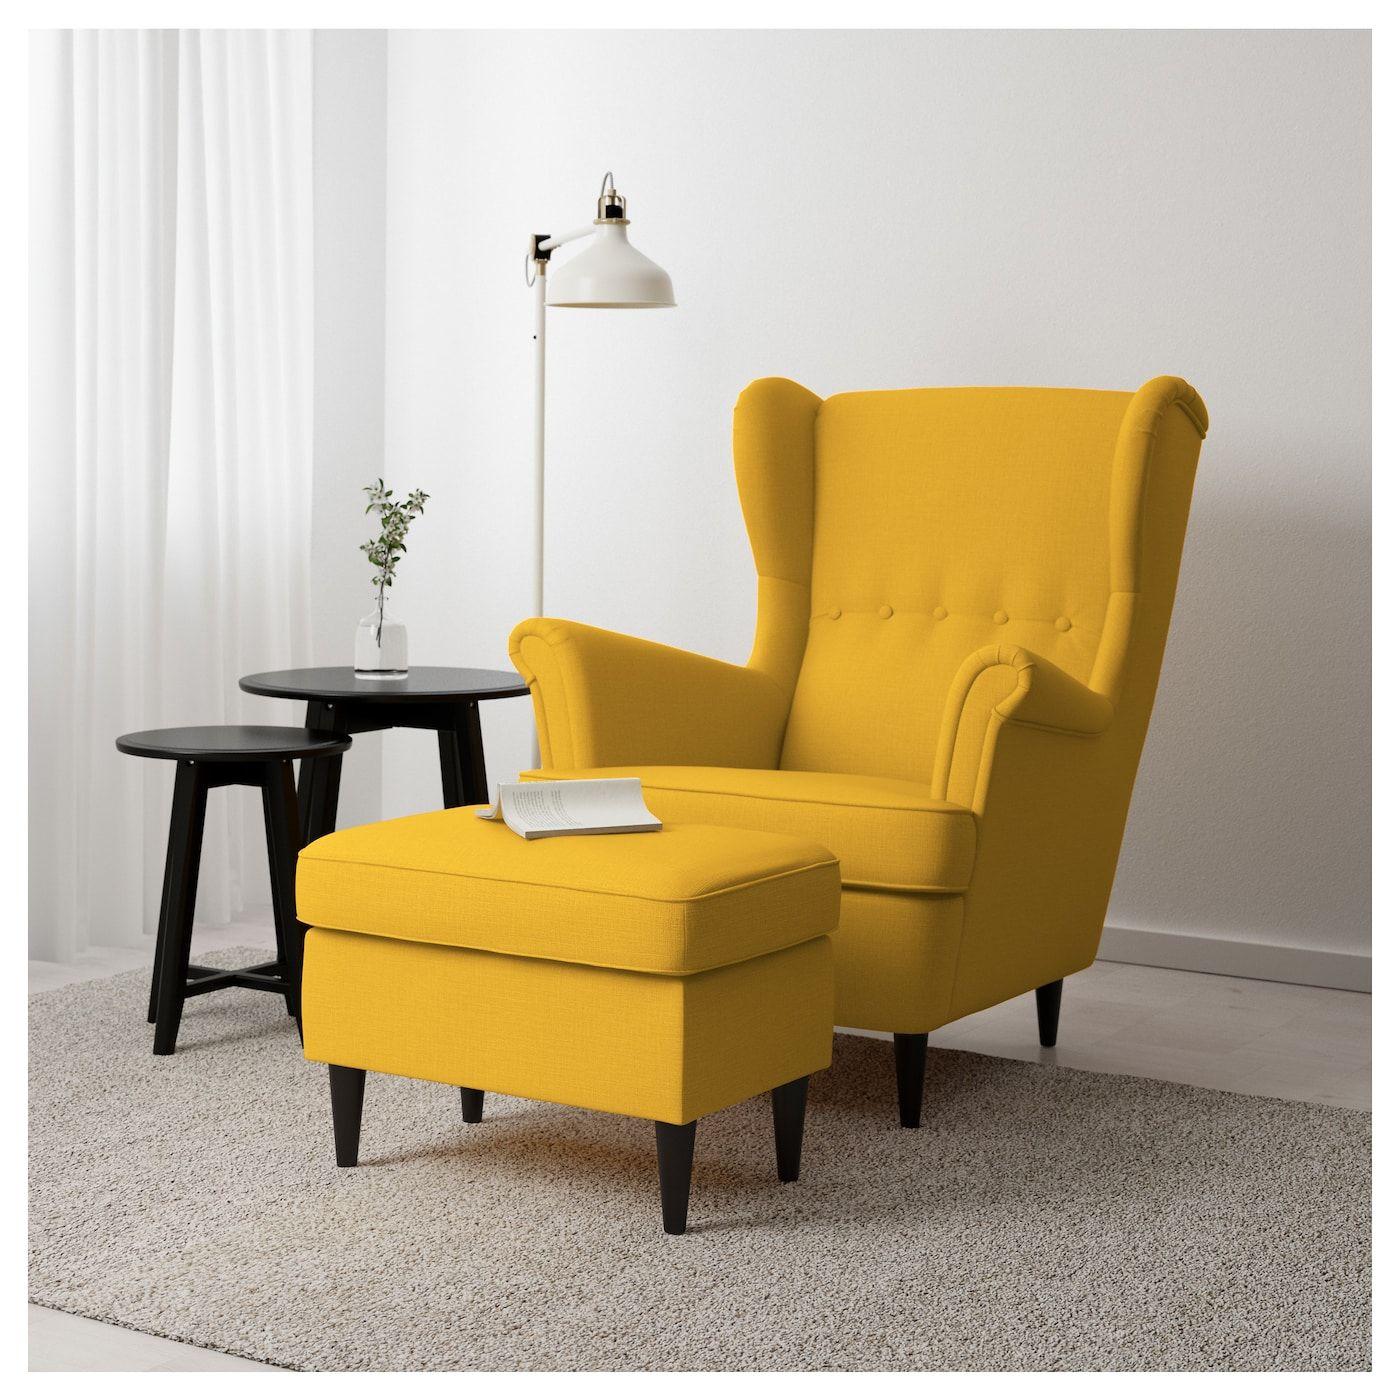 STRANDMON Voetenbank Skiftebo geel | Woonkamerstoelen